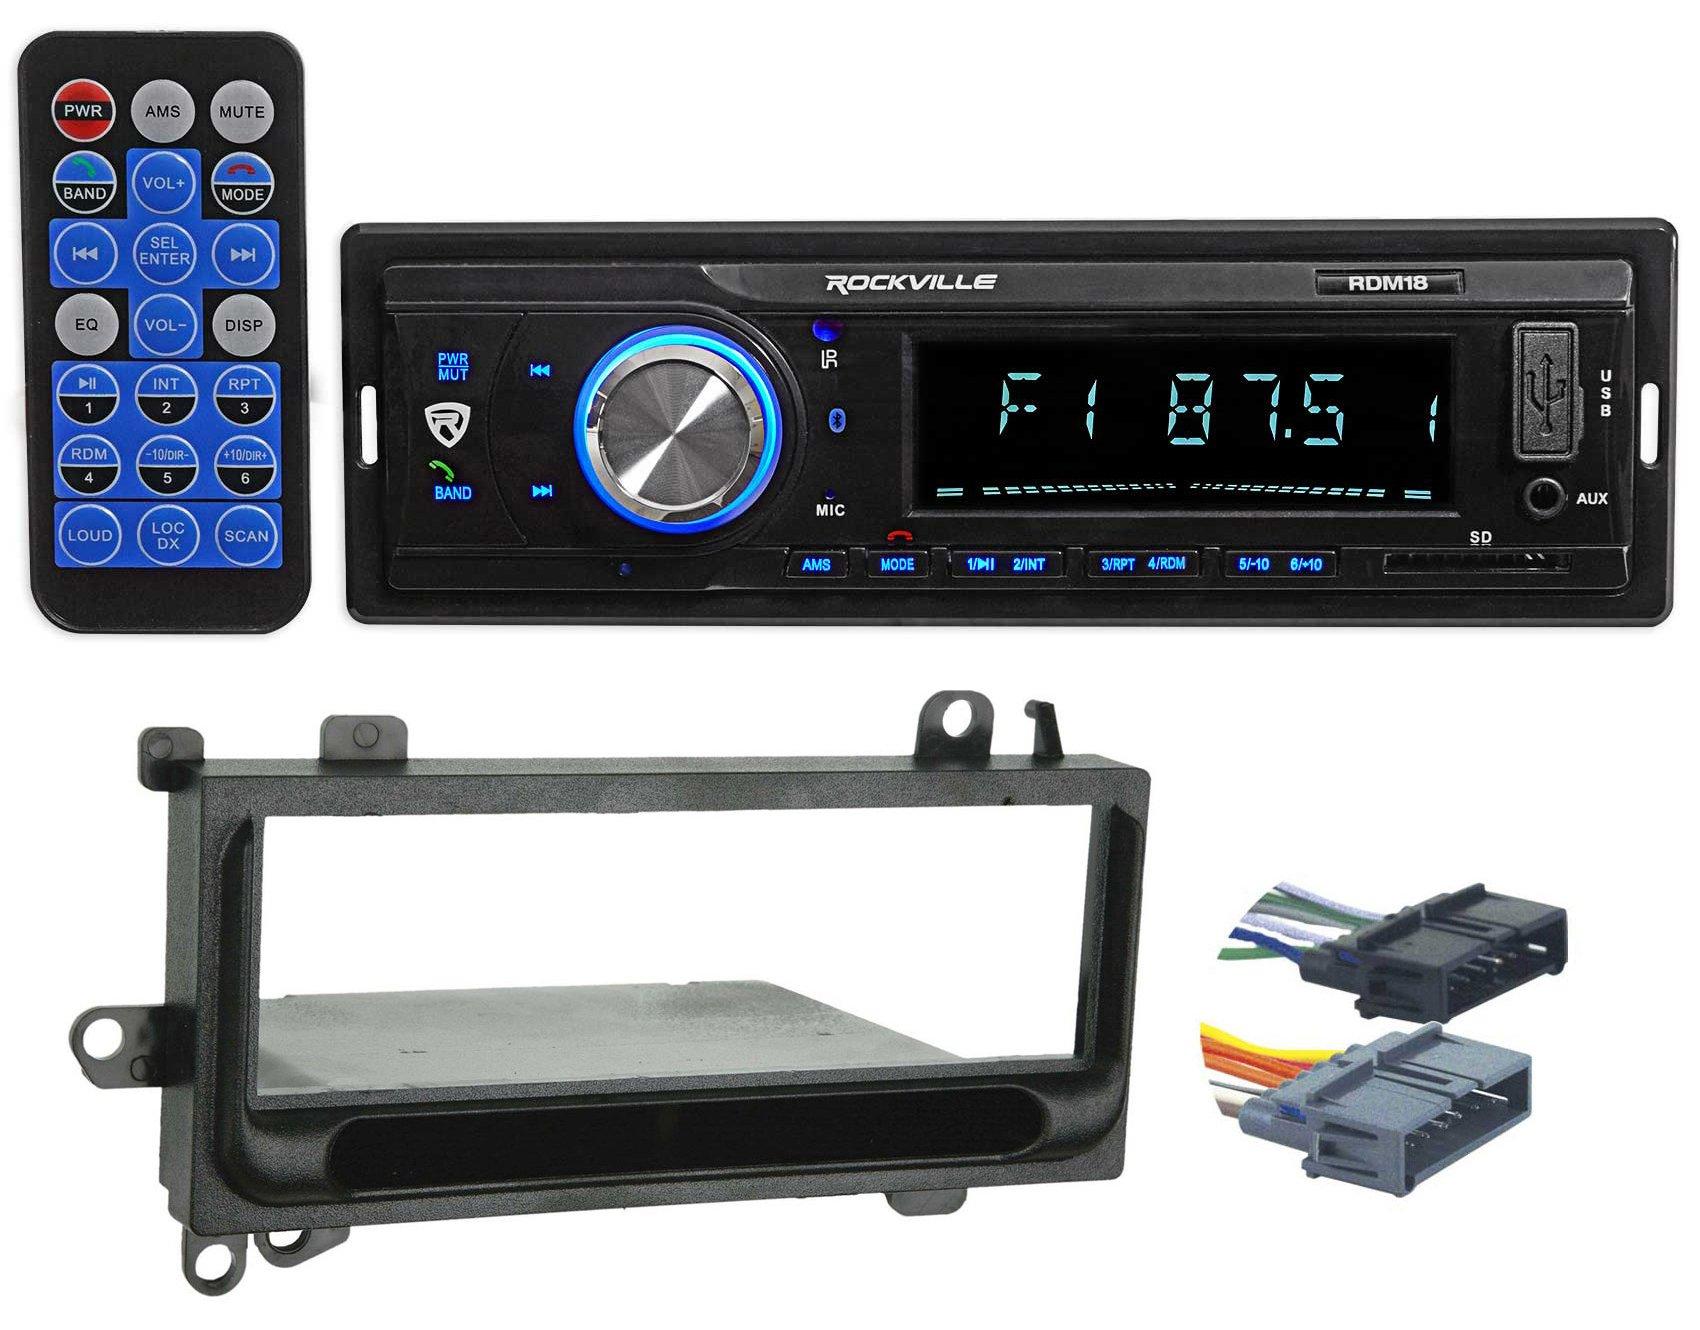 Digital Media Receiver/Radio w/Bluetooth MP3 USB/SD for 97-02 Jeep Wrangler TJ by Rockville